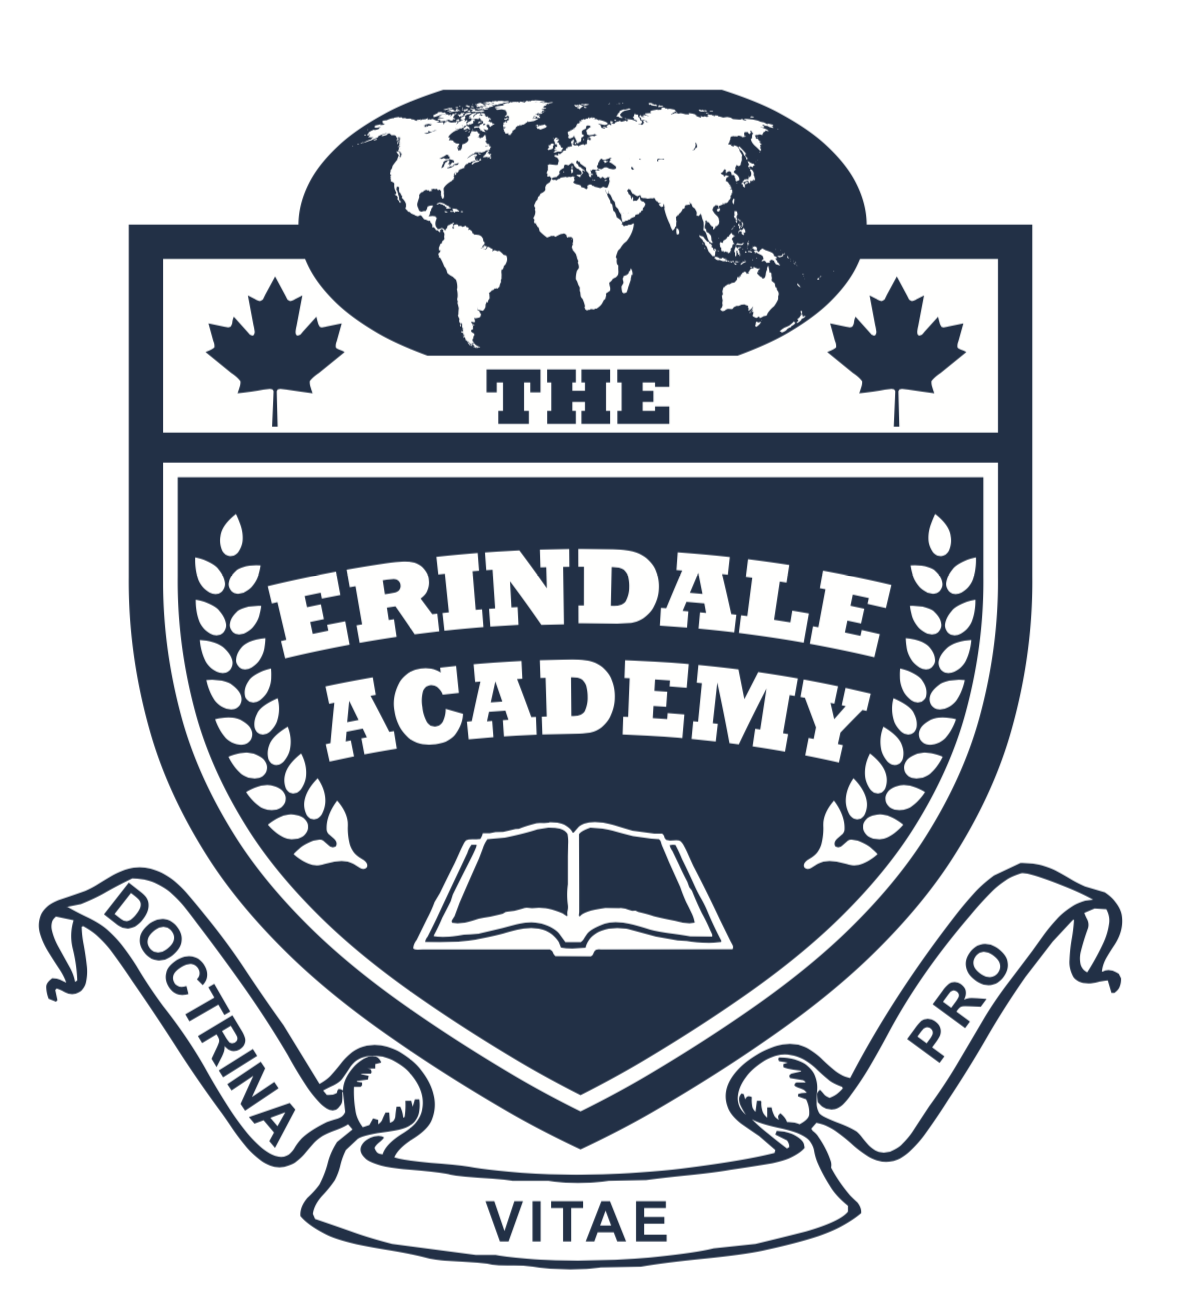 The Erindale Academy